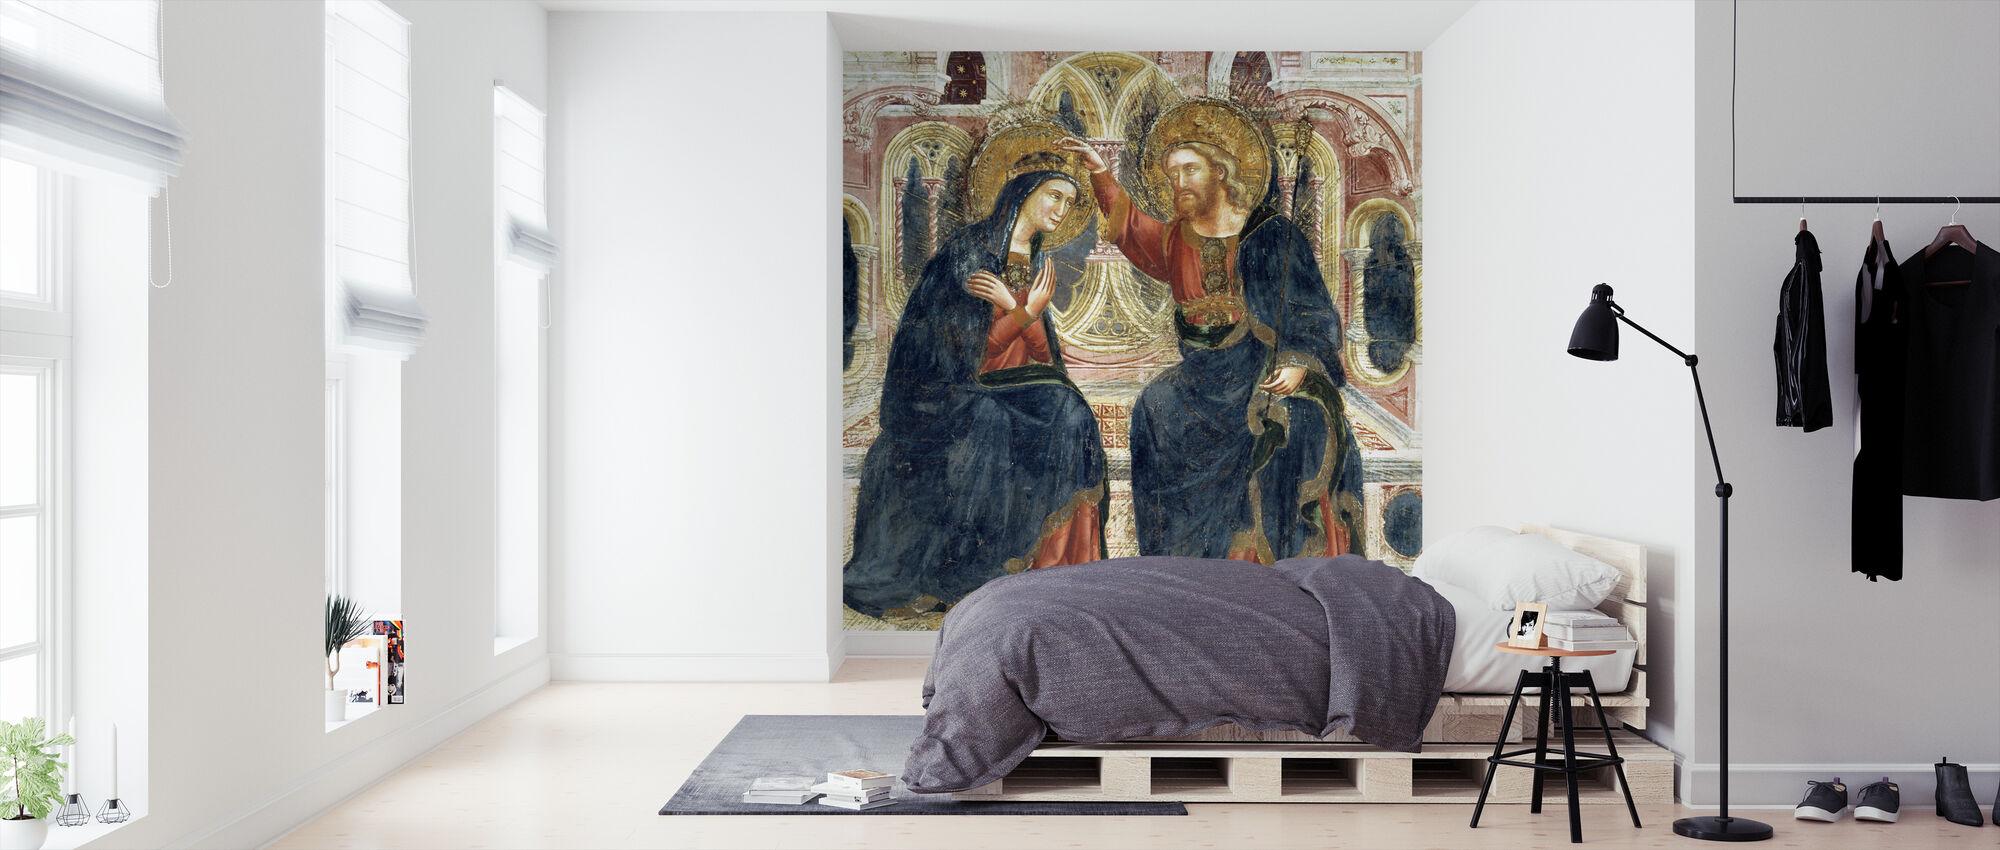 Neitsyen kruunaus - Guariento di Arpo - Tapetti - Makuuhuone